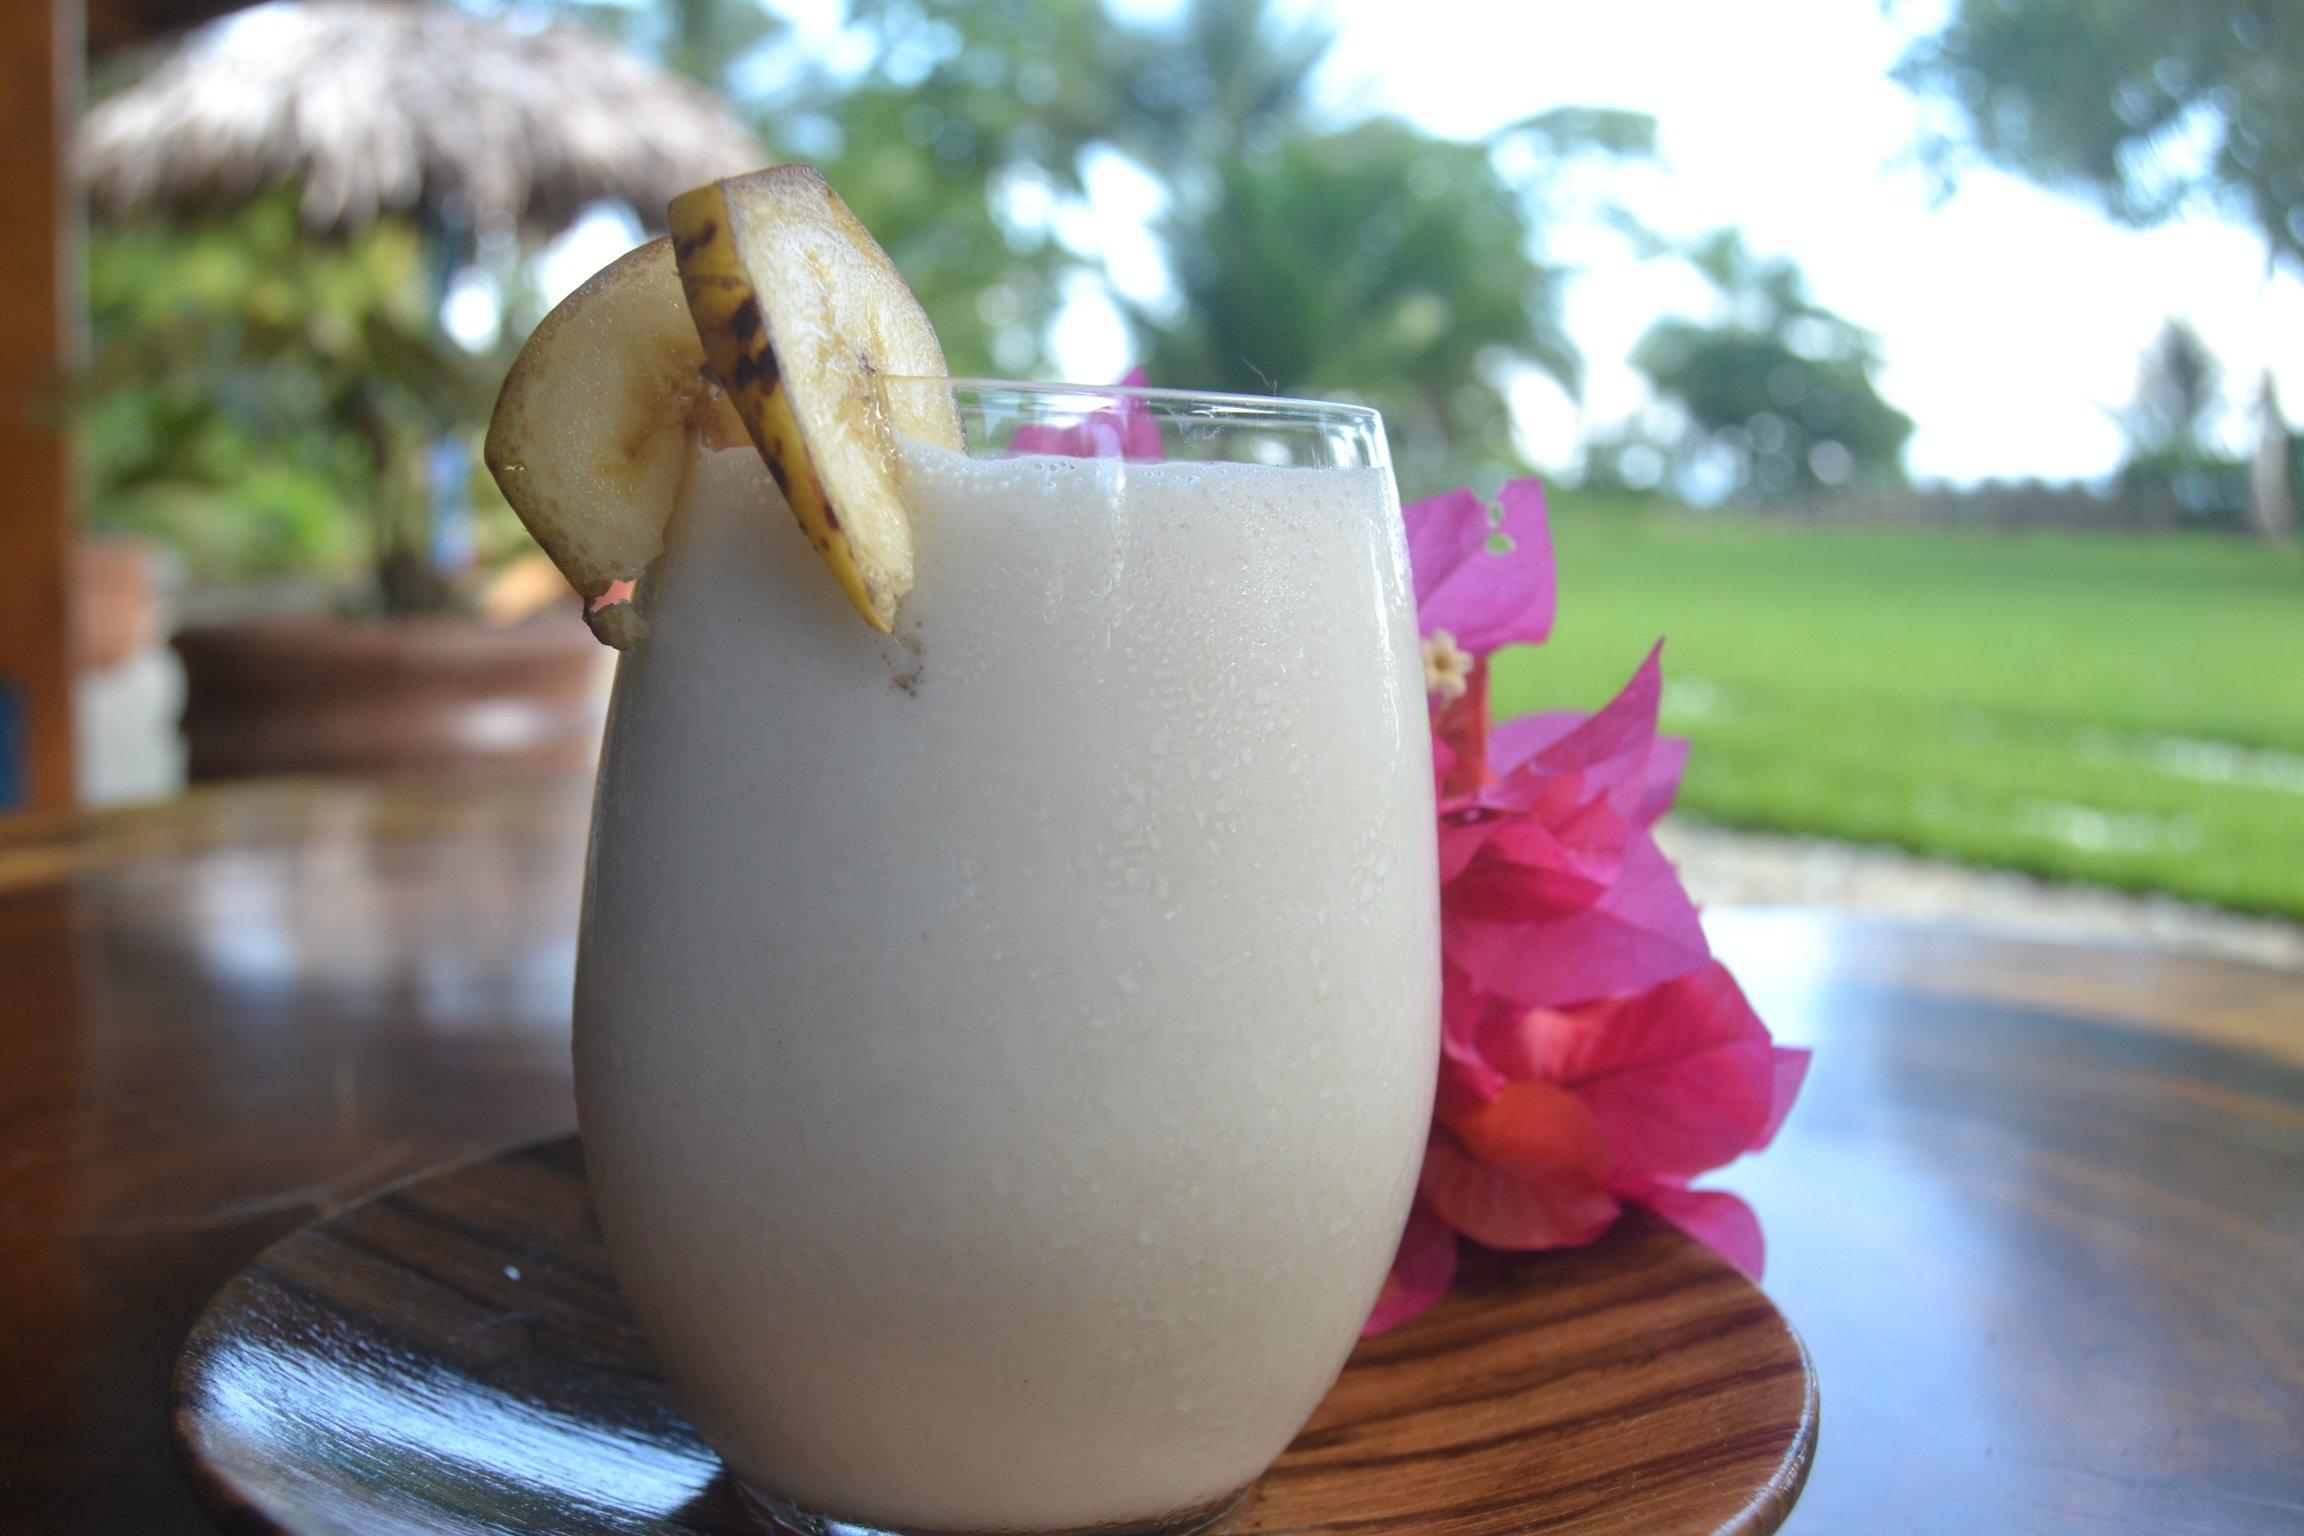 Blue Osa's Signature Banana Soy Smoothie Recipe